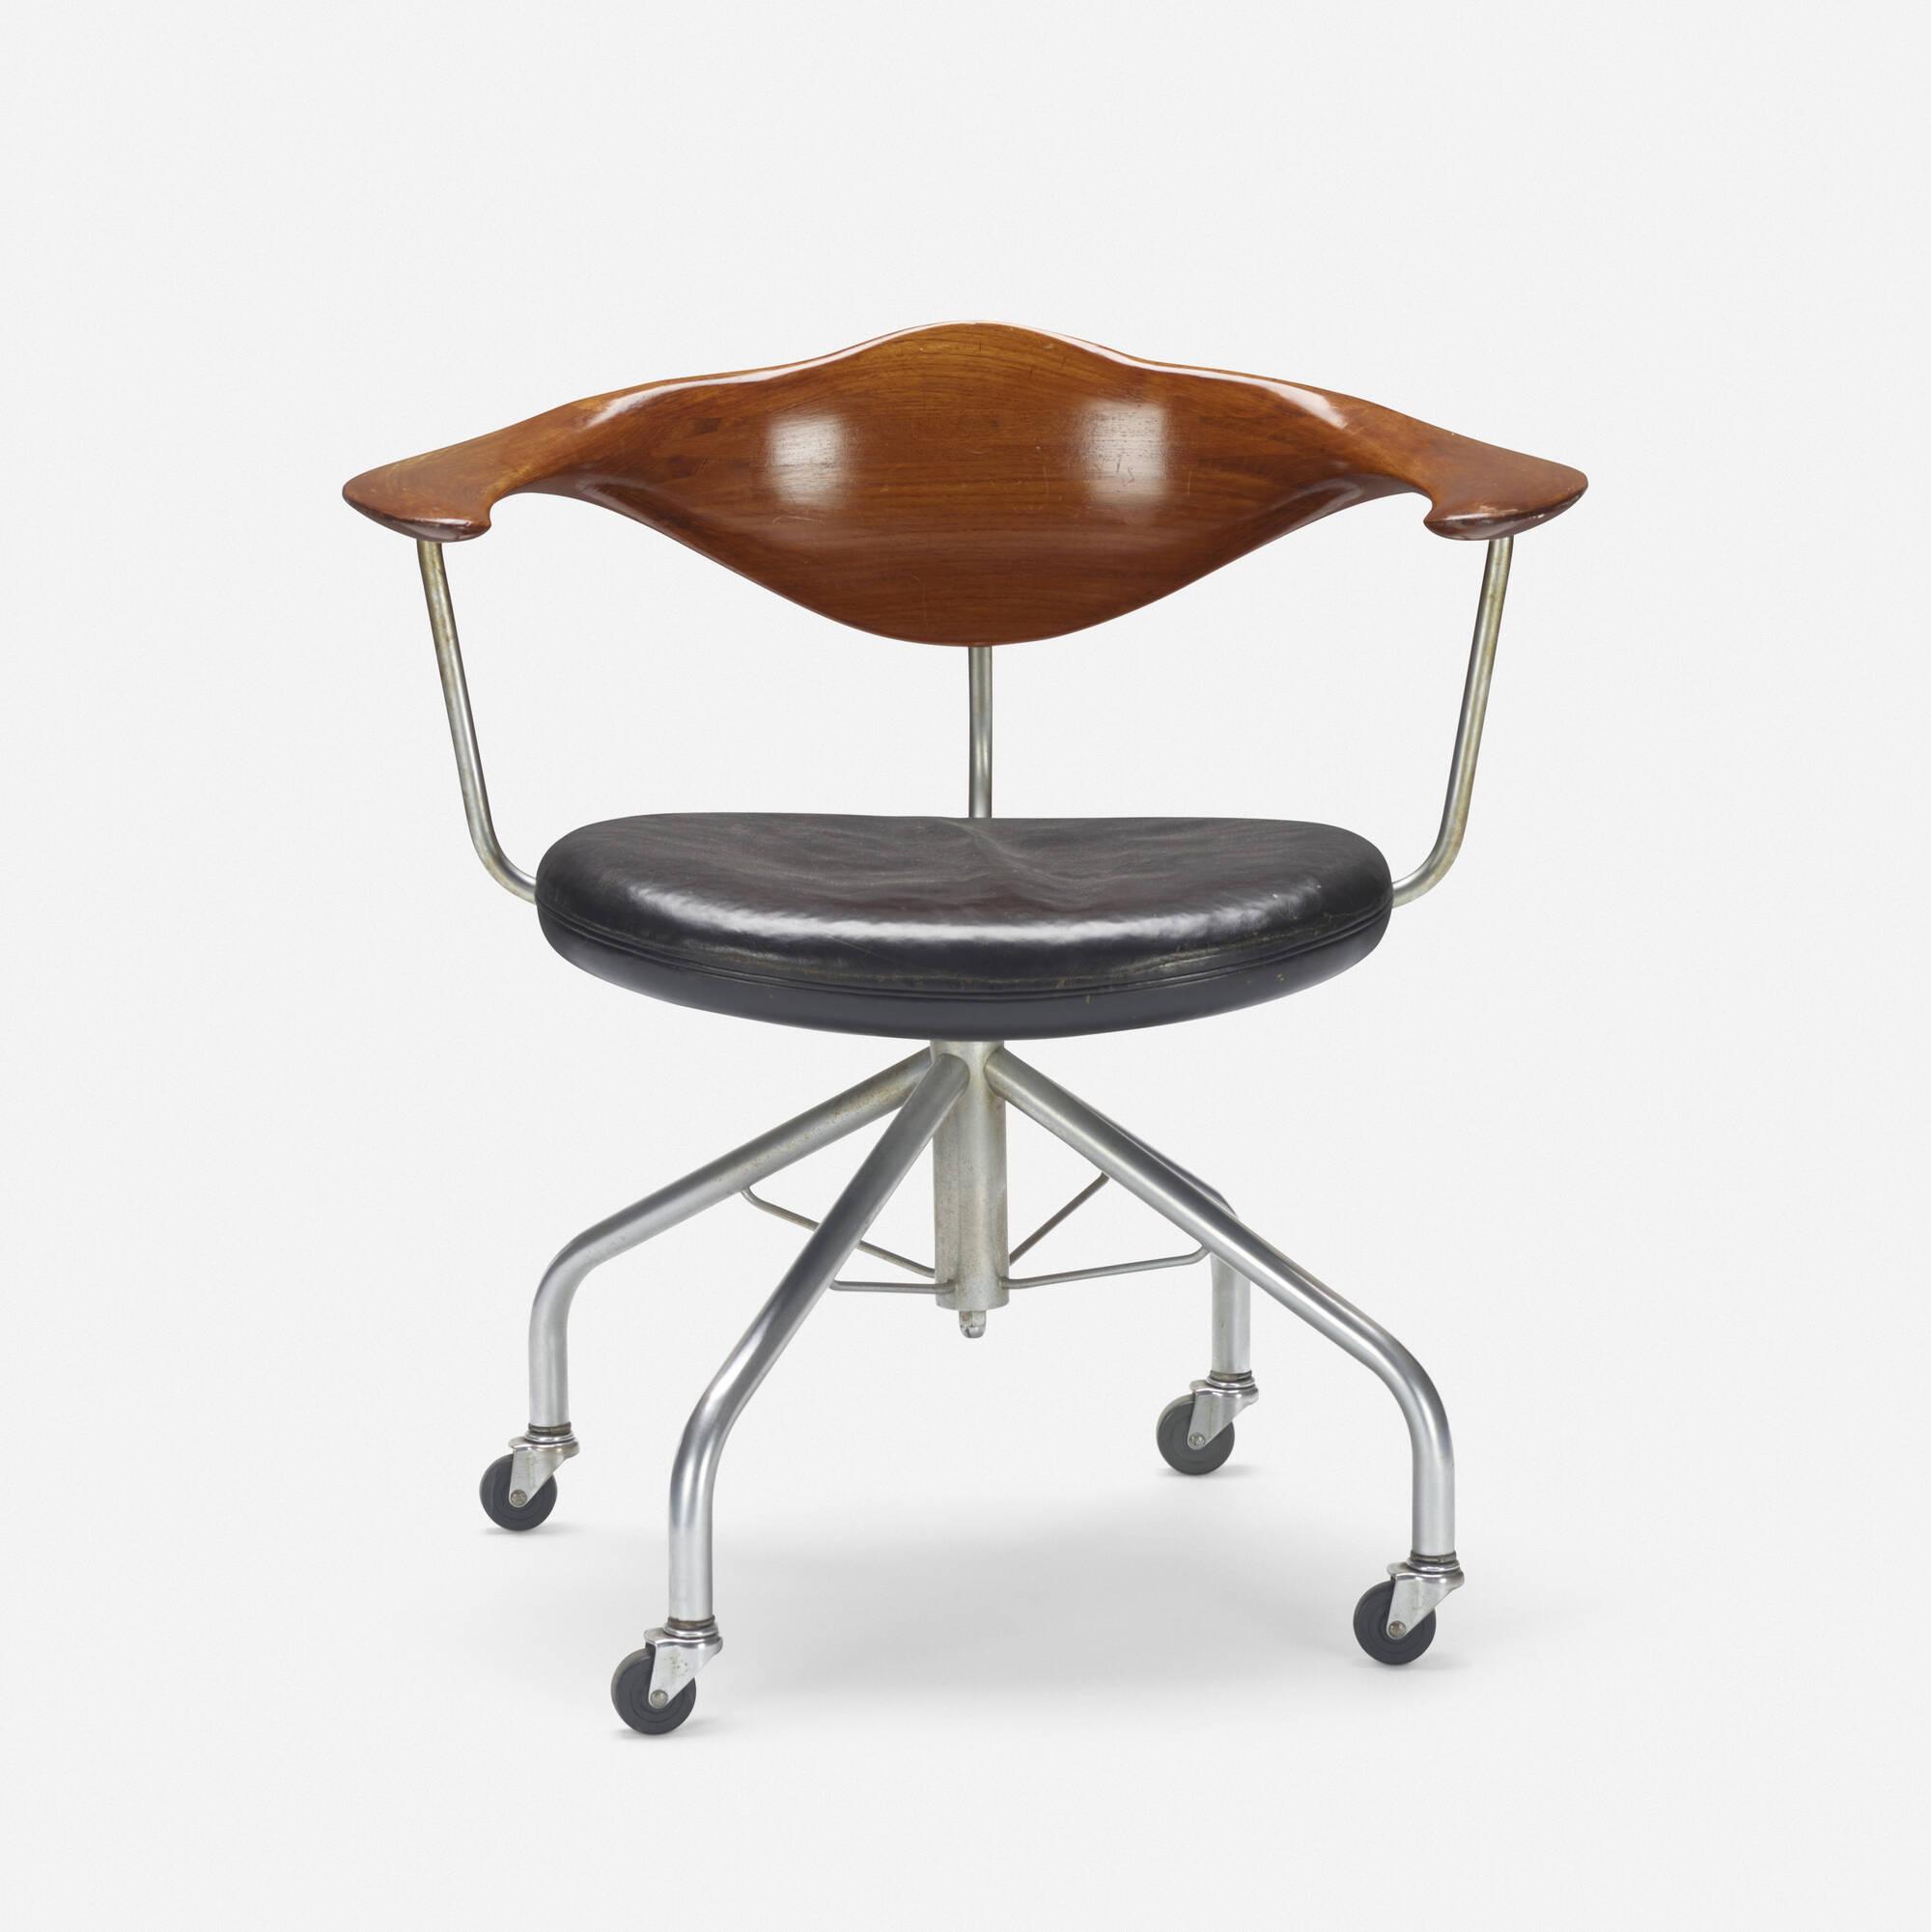 238 Hans J Wegner Swivel fice chair Design 23 March 2017